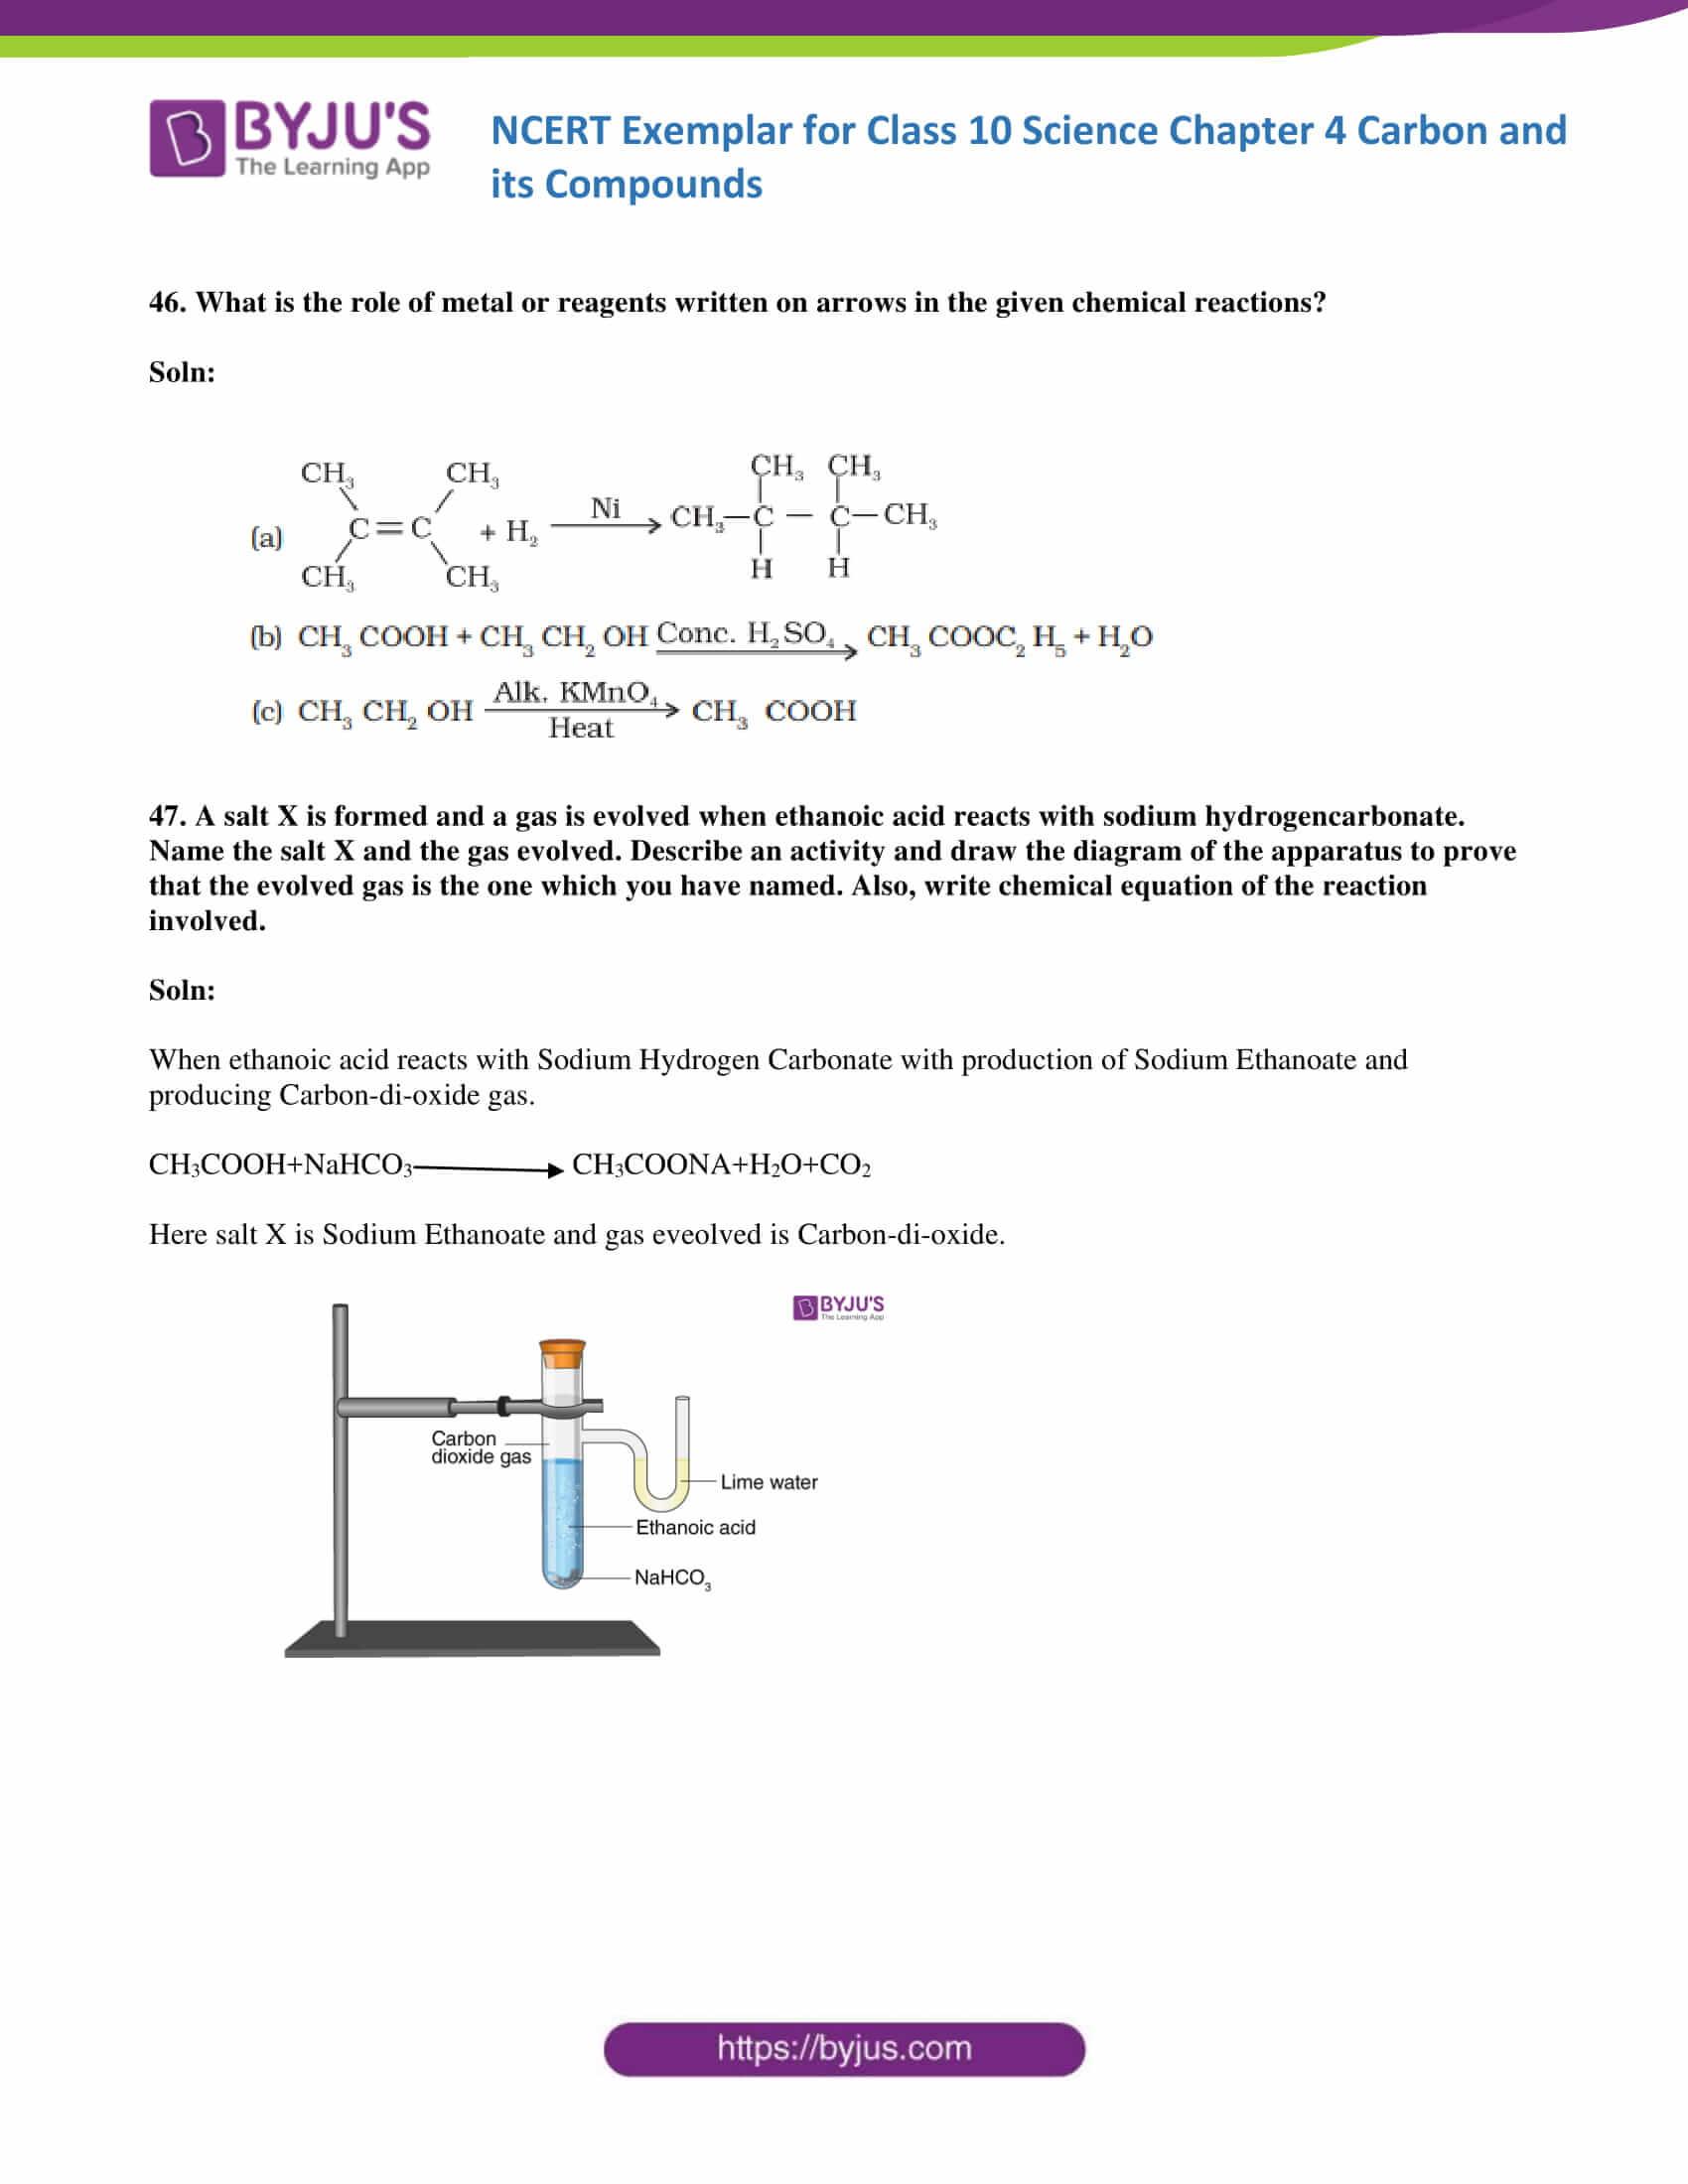 NCERT Exemplar Class 10 Science Solutions Chapter 4 - Free